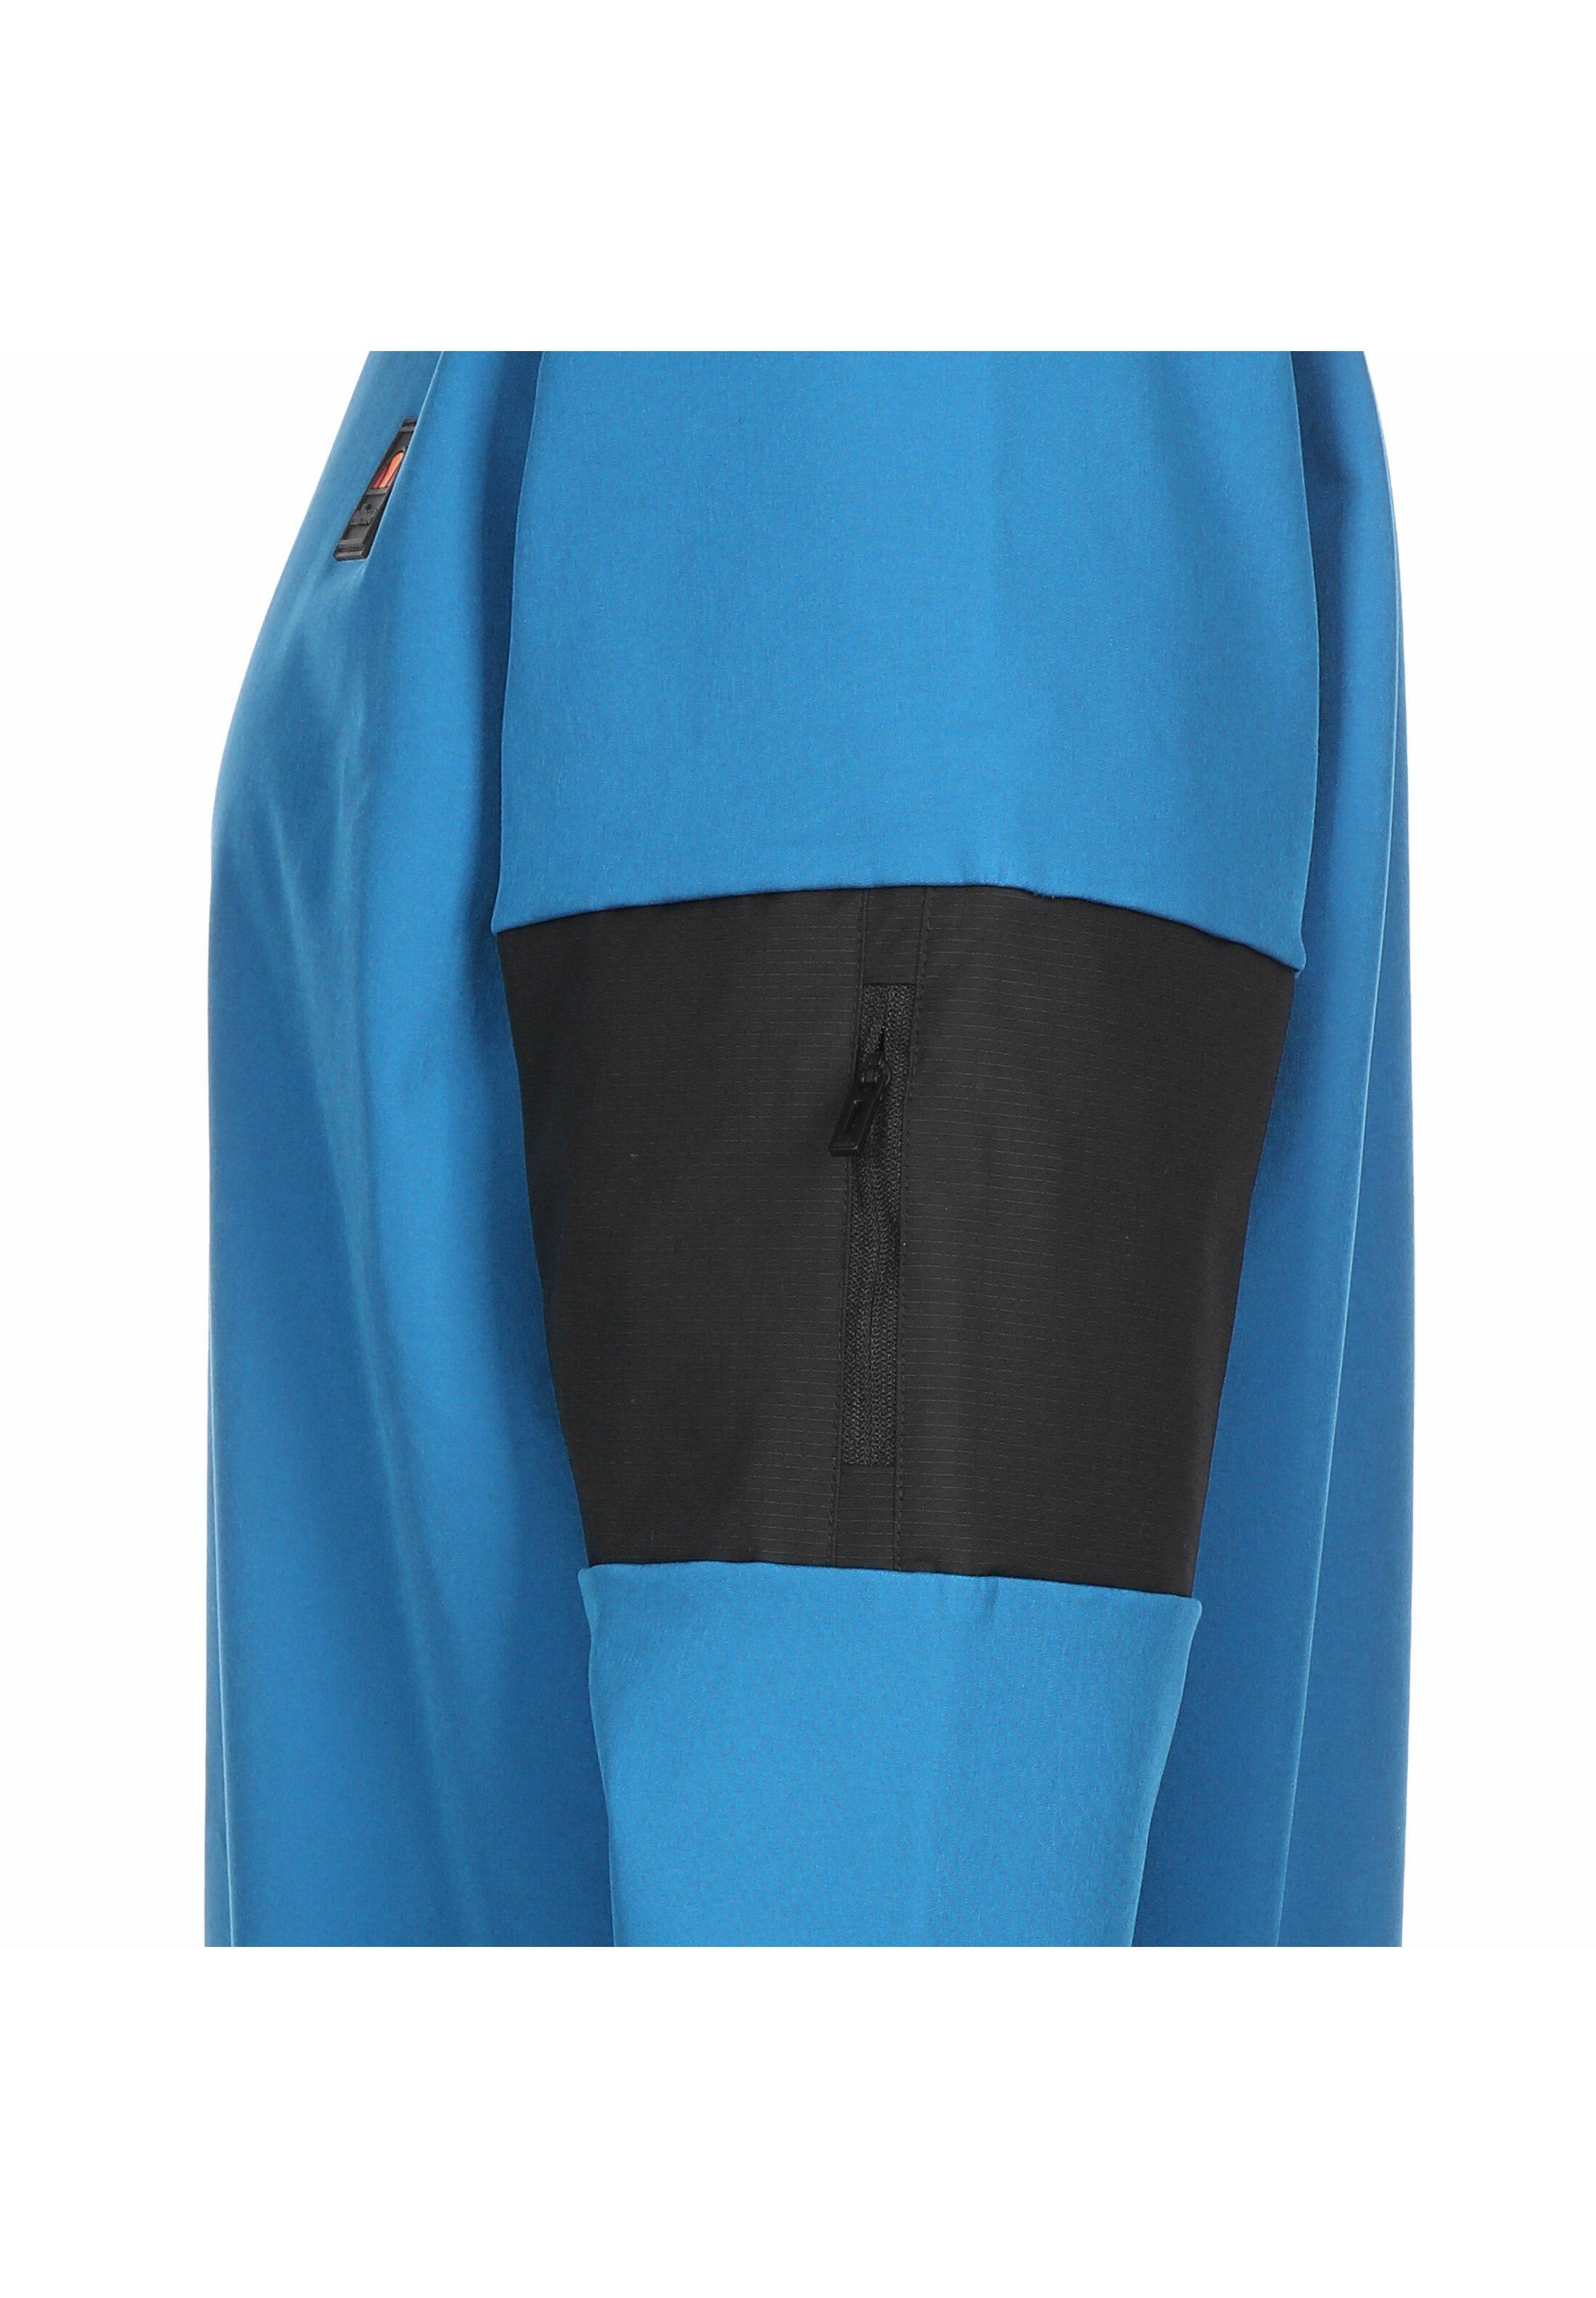 Ellesse DIVERIA Sweater blueBlauw Zalando.nl